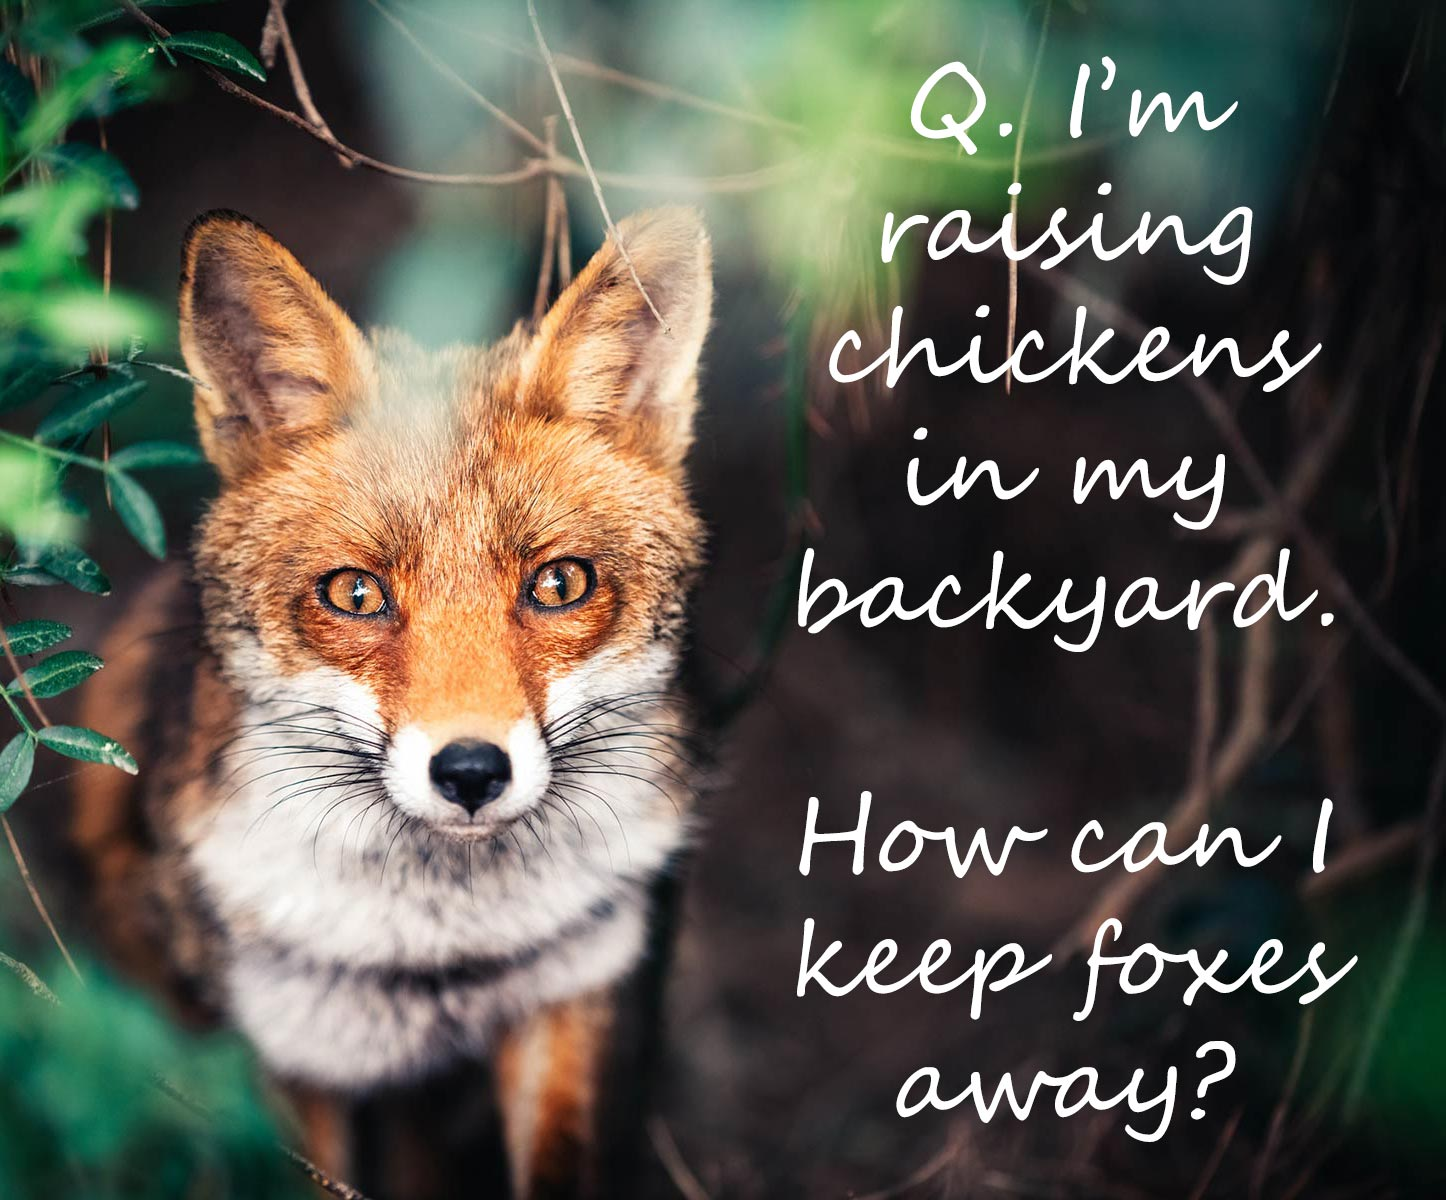 Canadian Wildlife Federation: I'm raising chickens in my ...